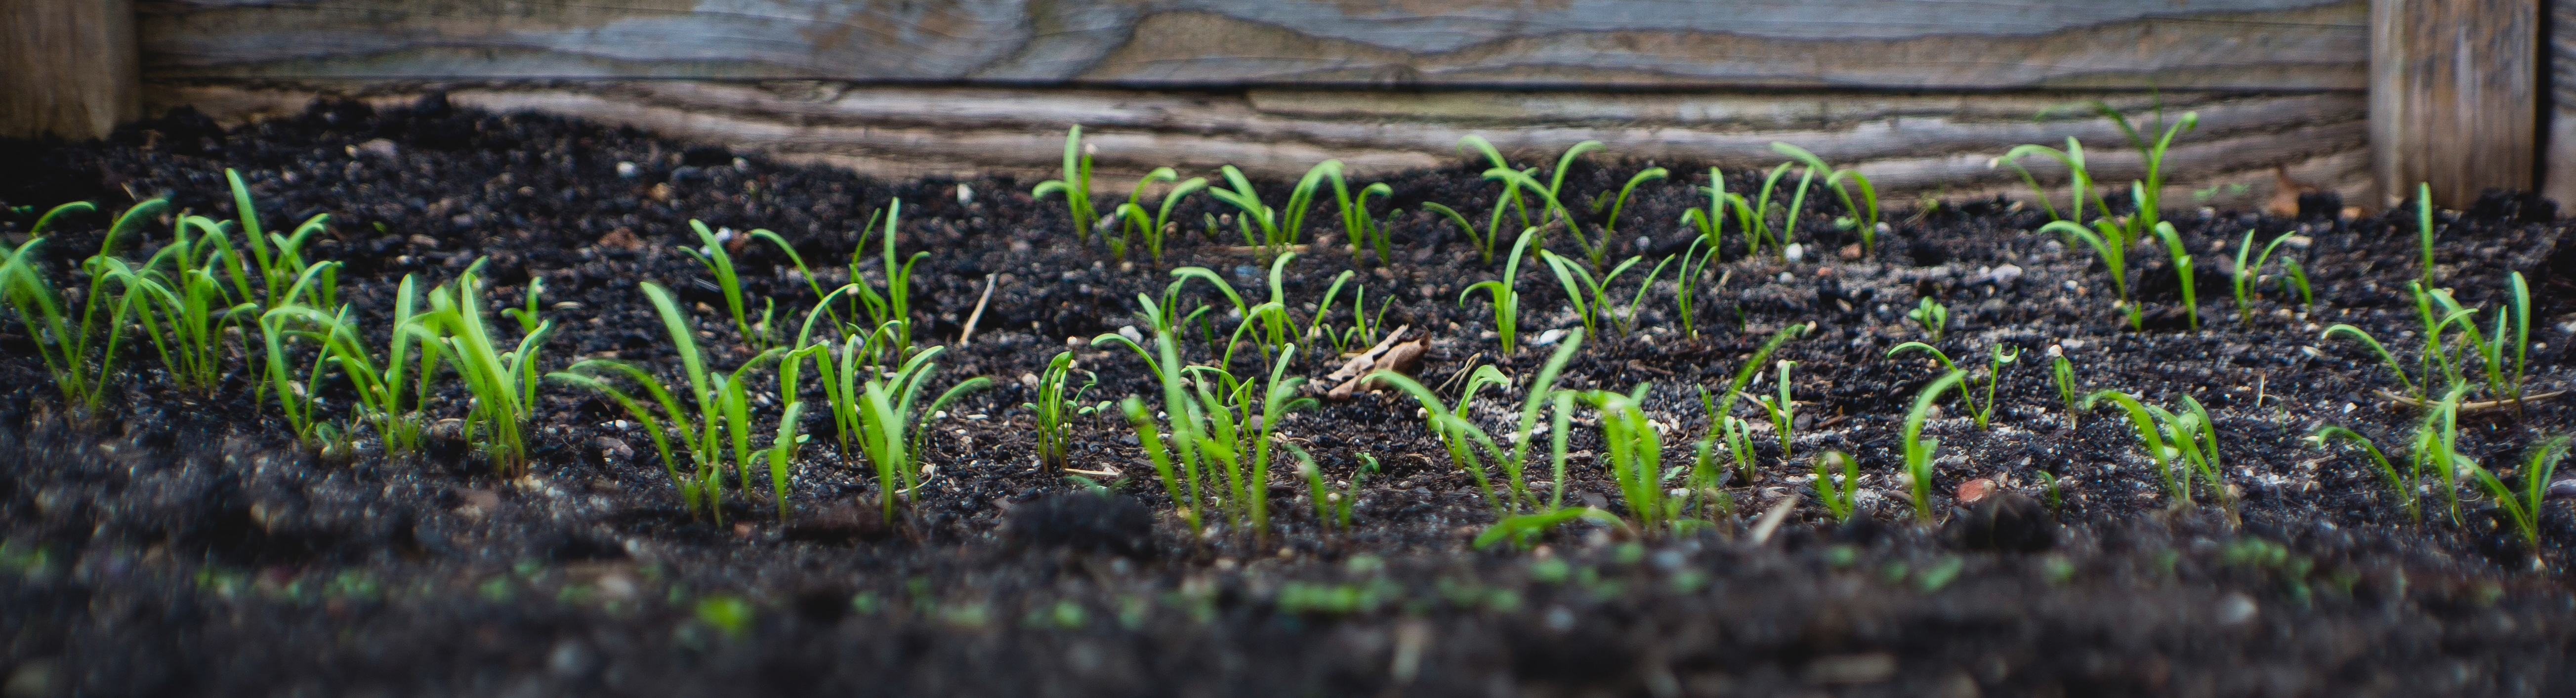 bluesky organics microbial growers